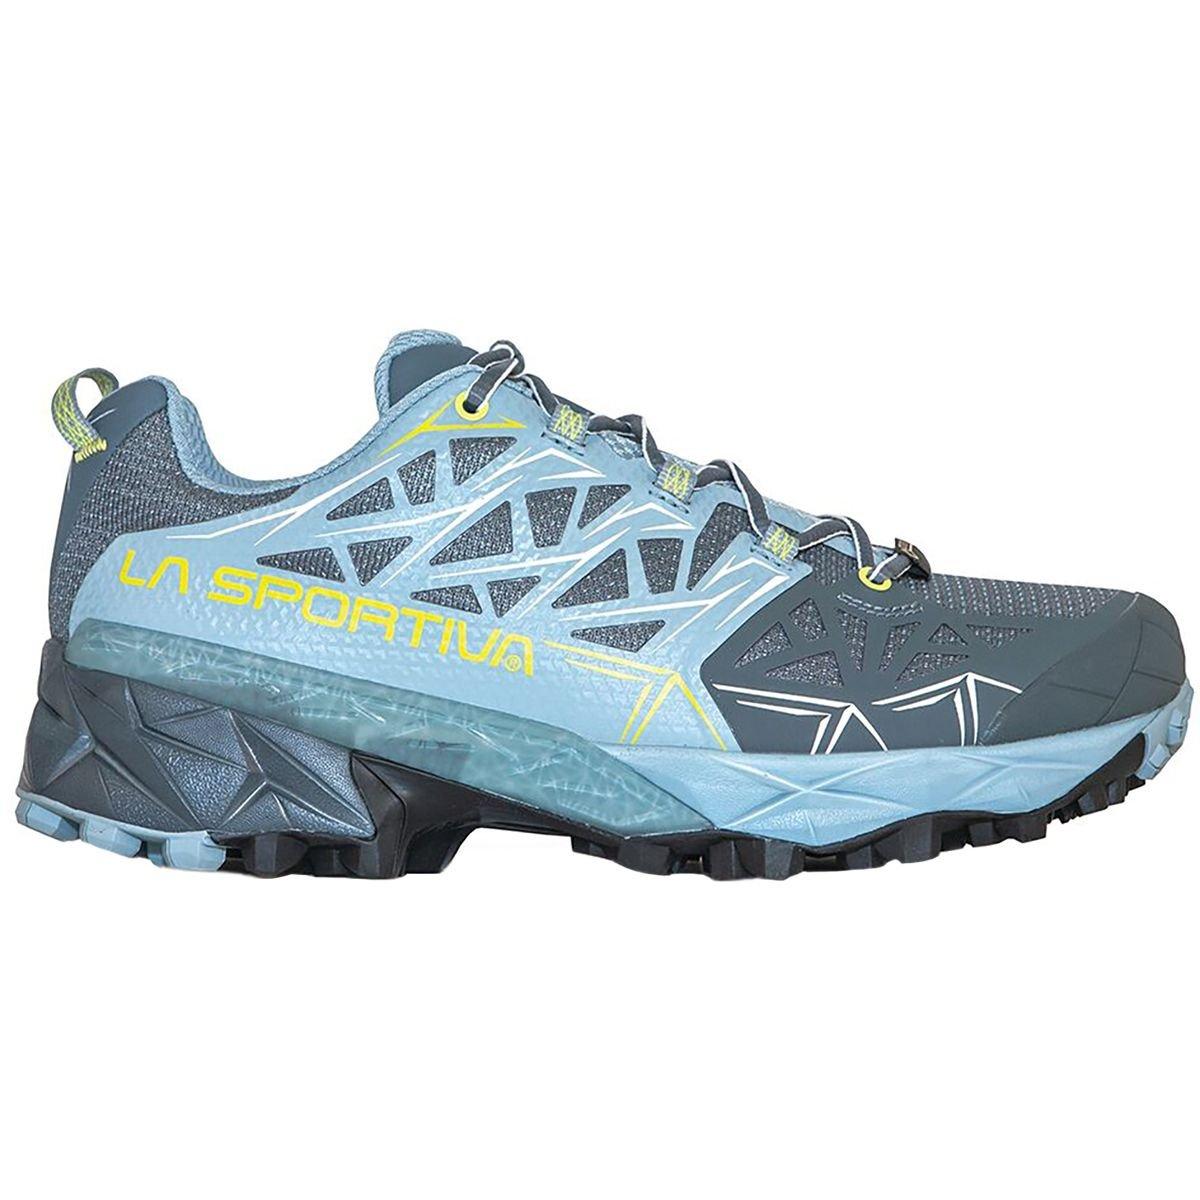 La Sportiva Akyra GTX Running Shoe - Women's B01NCAG69P 39 EU|Slate/Sulphur